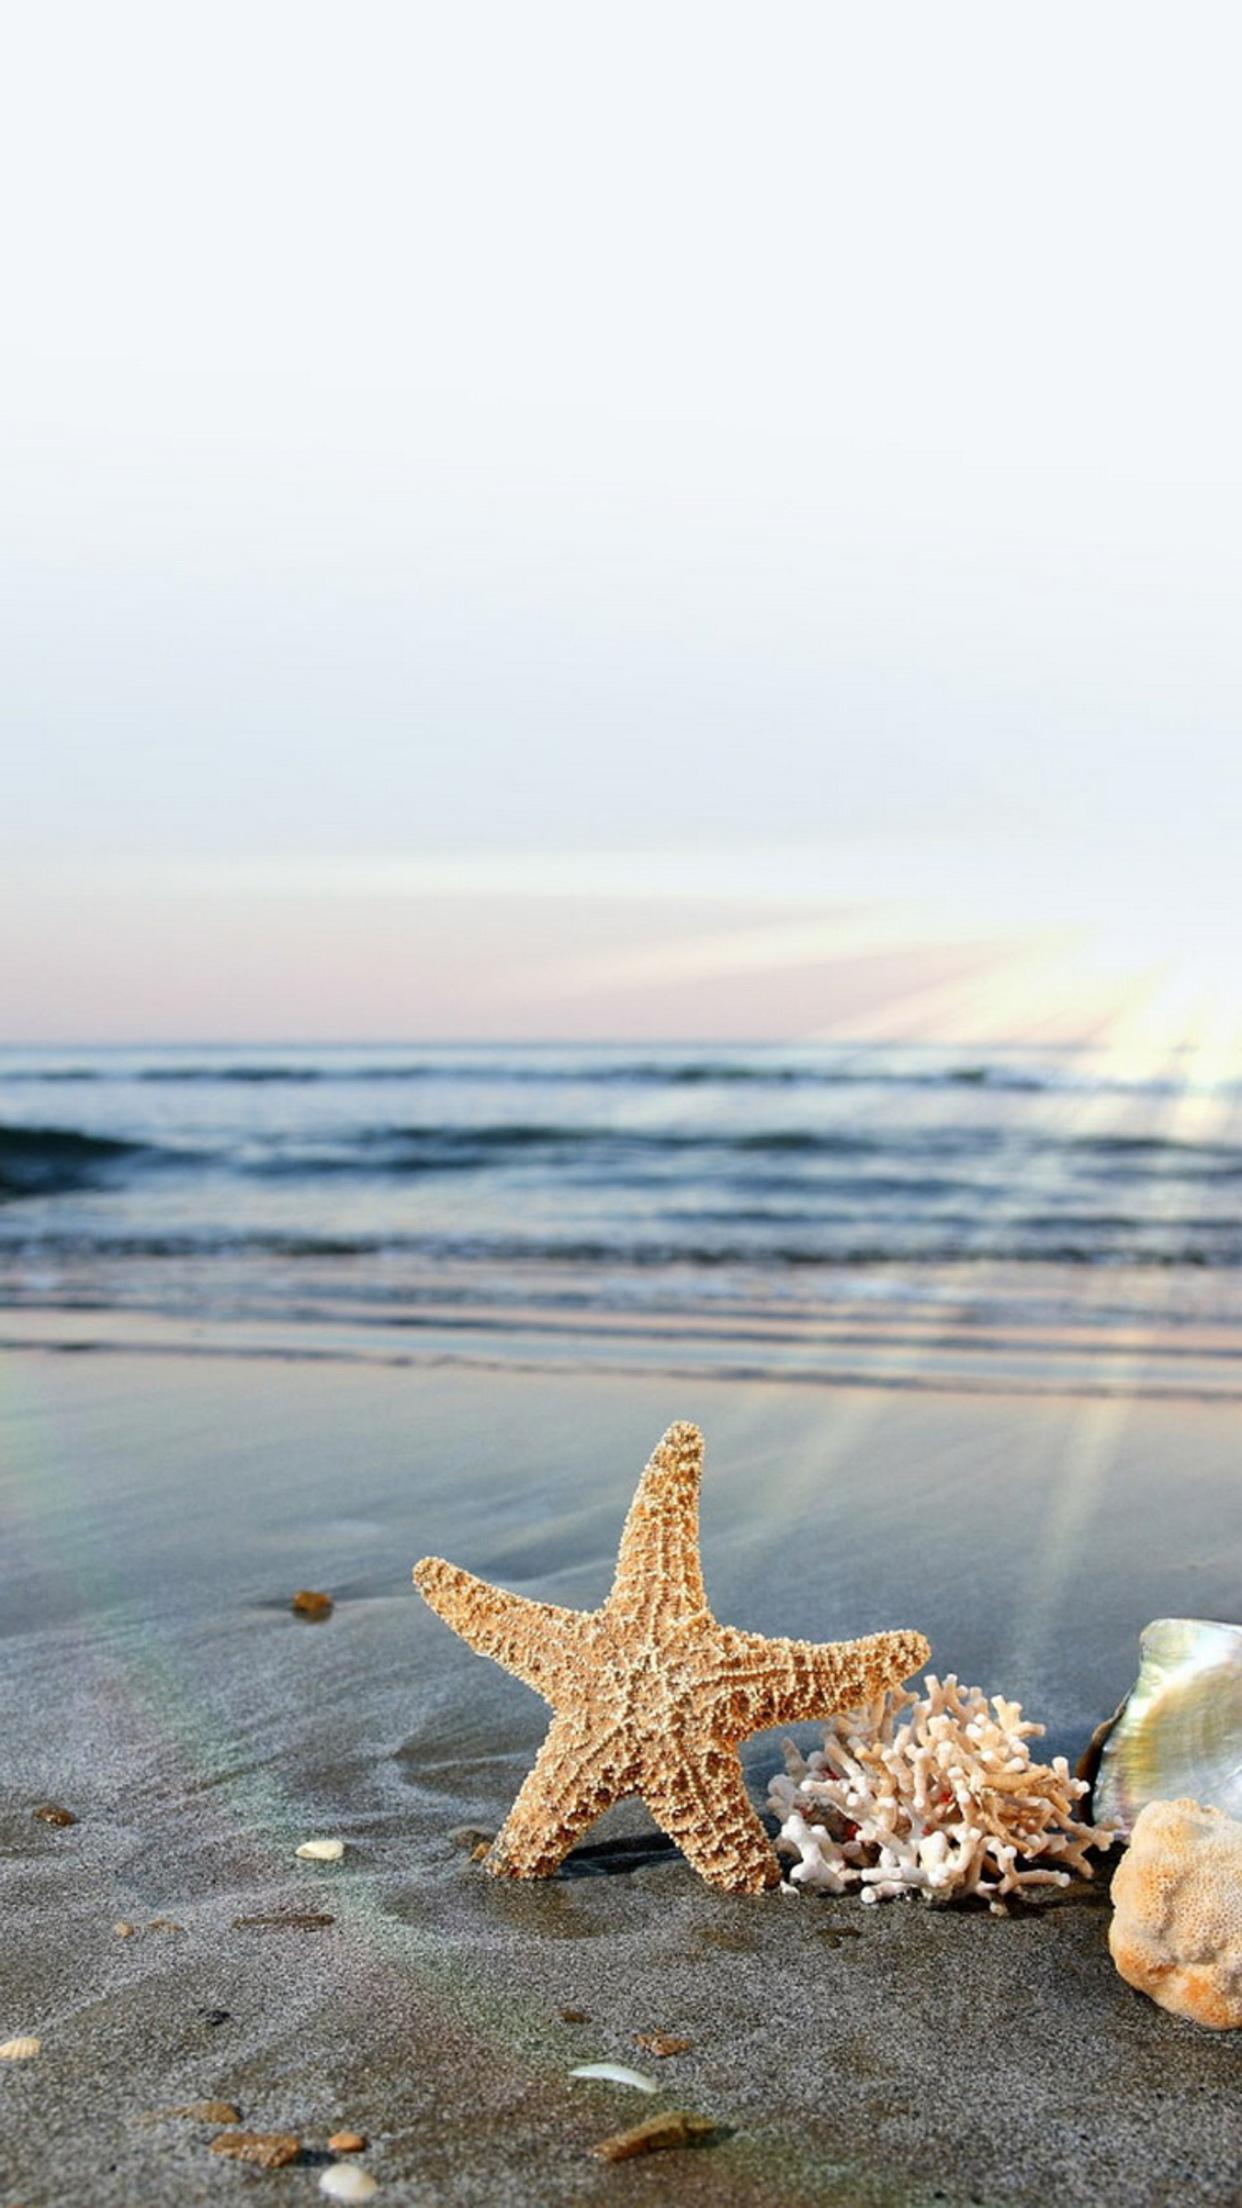 plage etoile mer 3Wallpapers iPhone Parallax Beach sea star